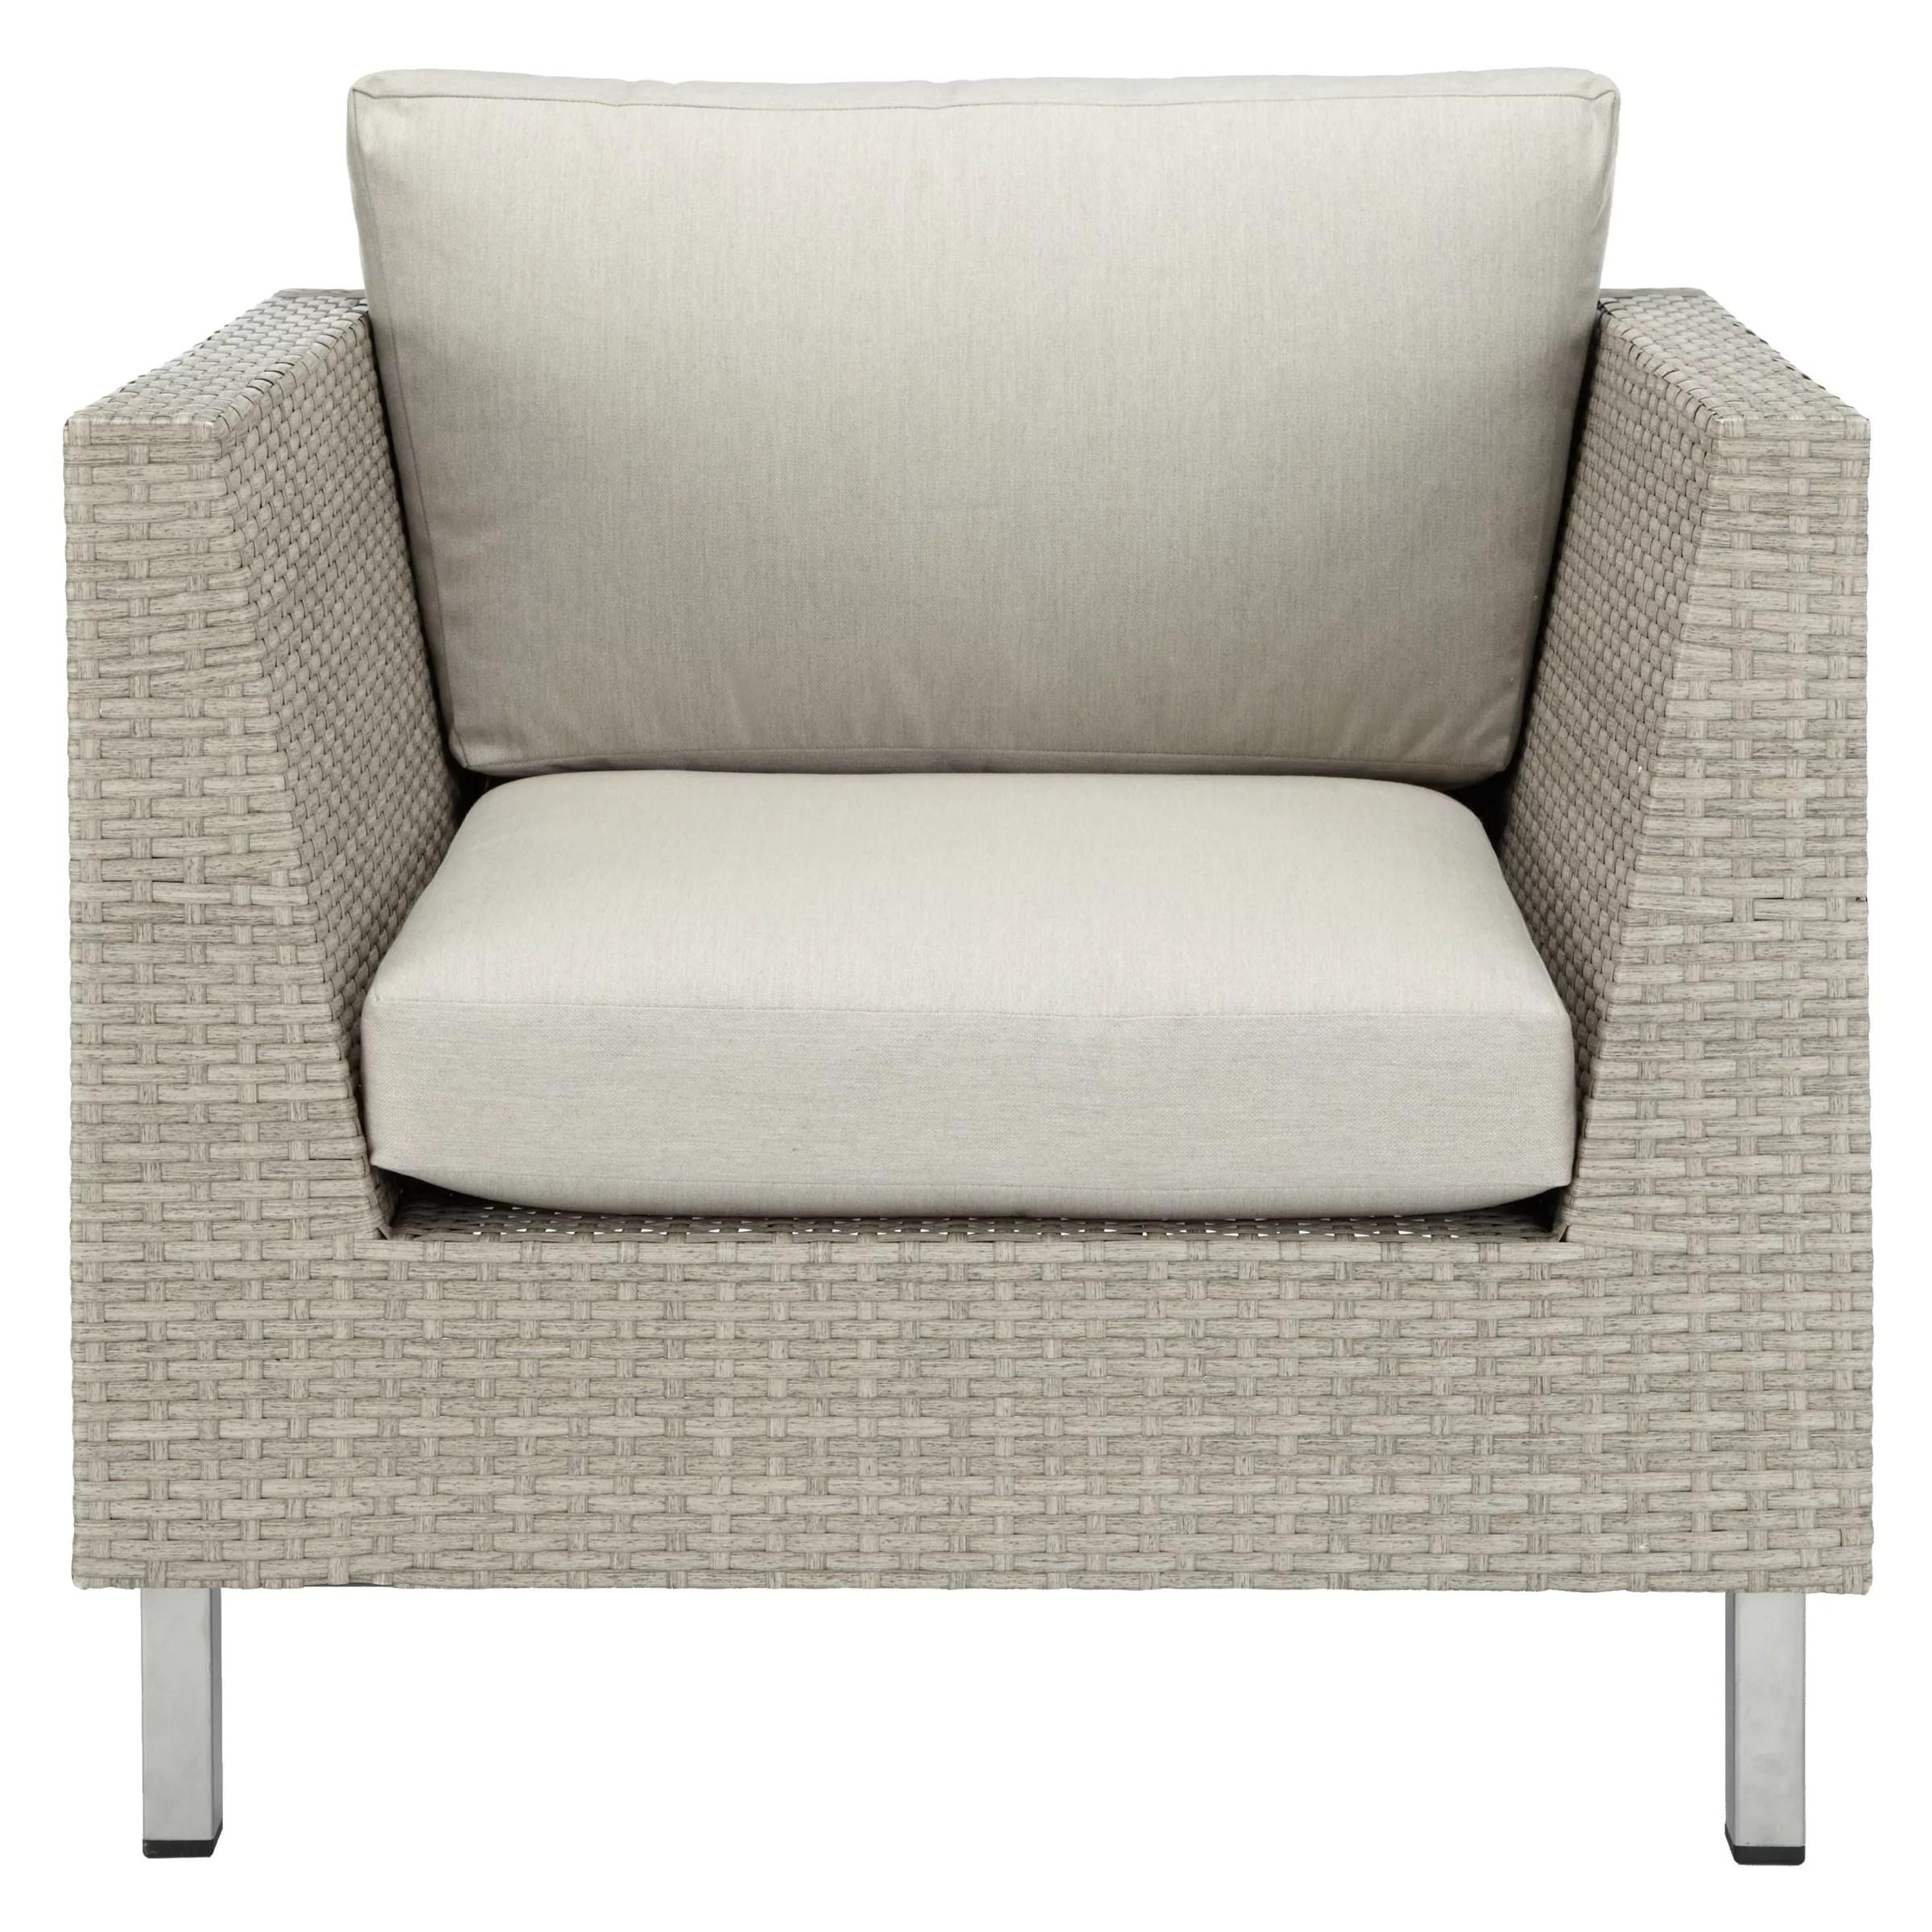 wicker sofa set philippines flip flop bed buy john lewis madrid outdoor lounging armchair |